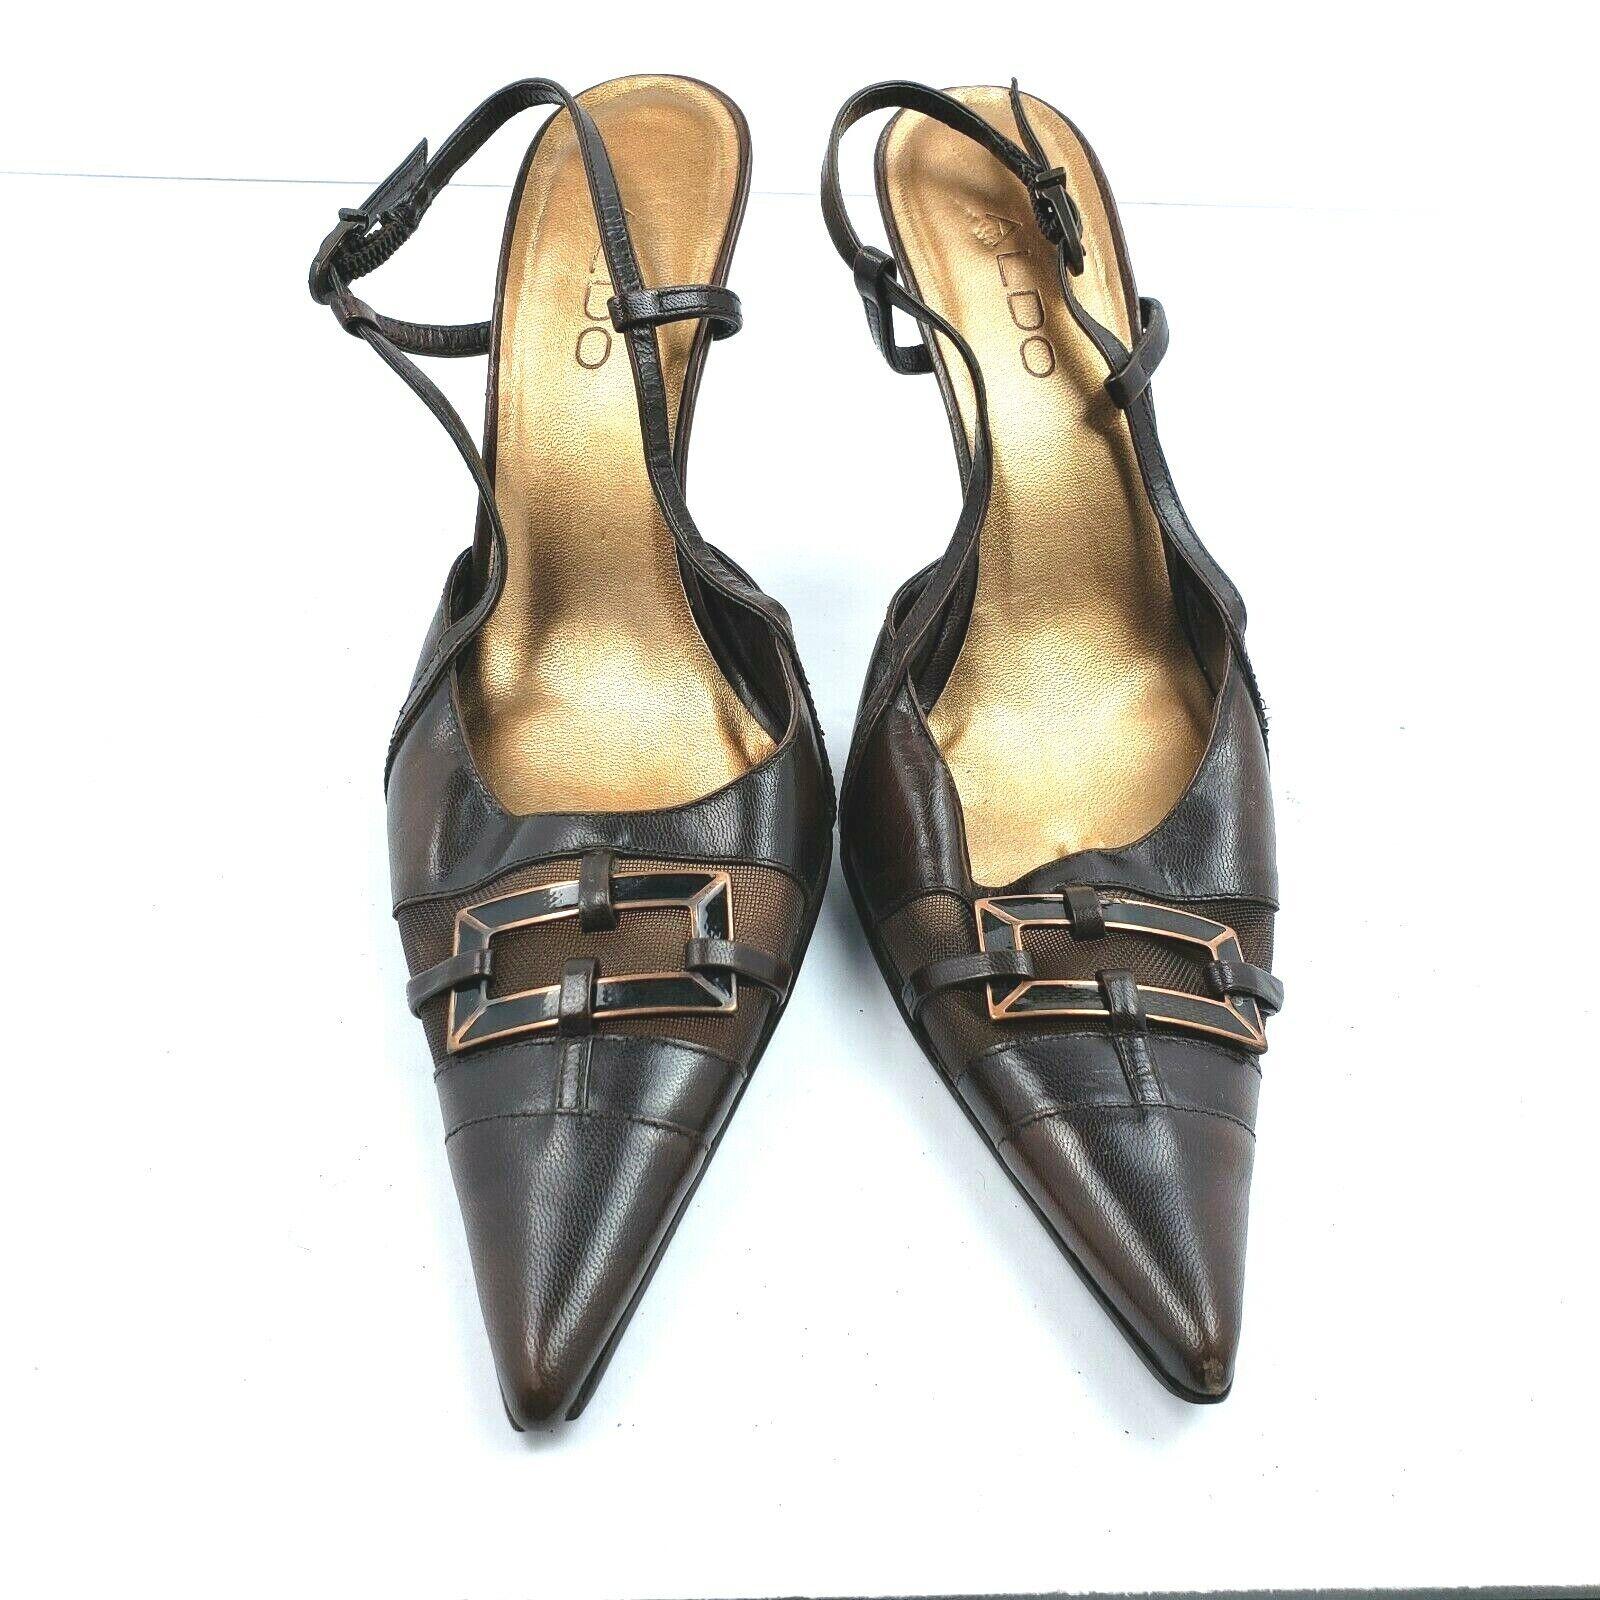 Aldo Womens Brown Leather Pointed Toe Stiletto Pumps Ankle Strap SZ EU 39 Us 8.5